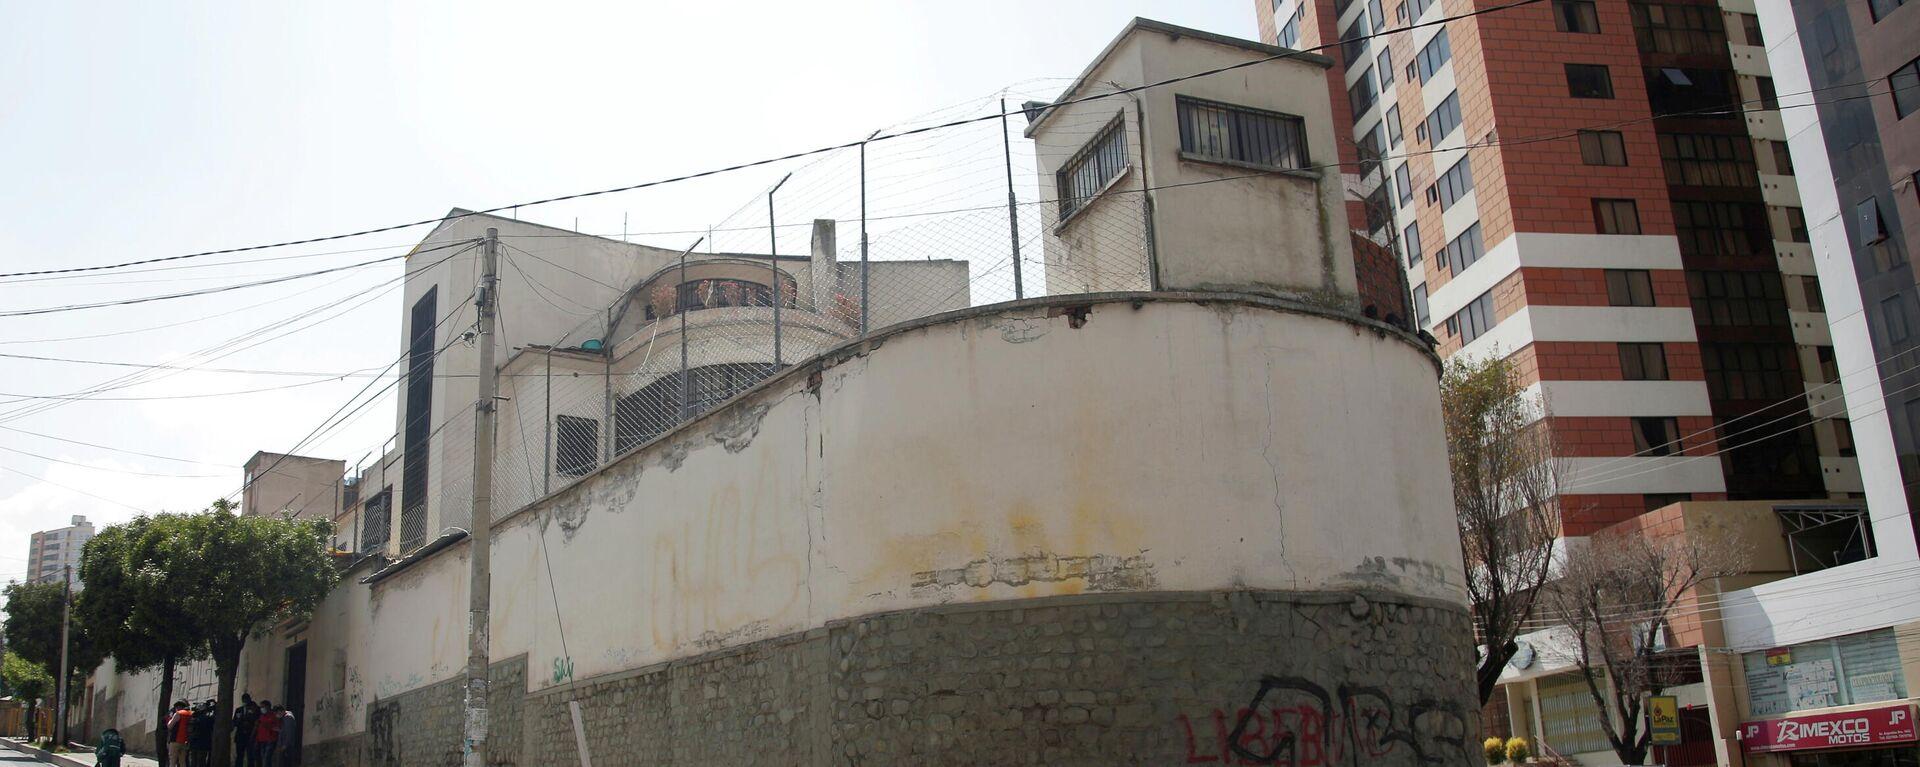 La cárcel femenina de Miraflores - Sputnik Mundo, 1920, 24.08.2021